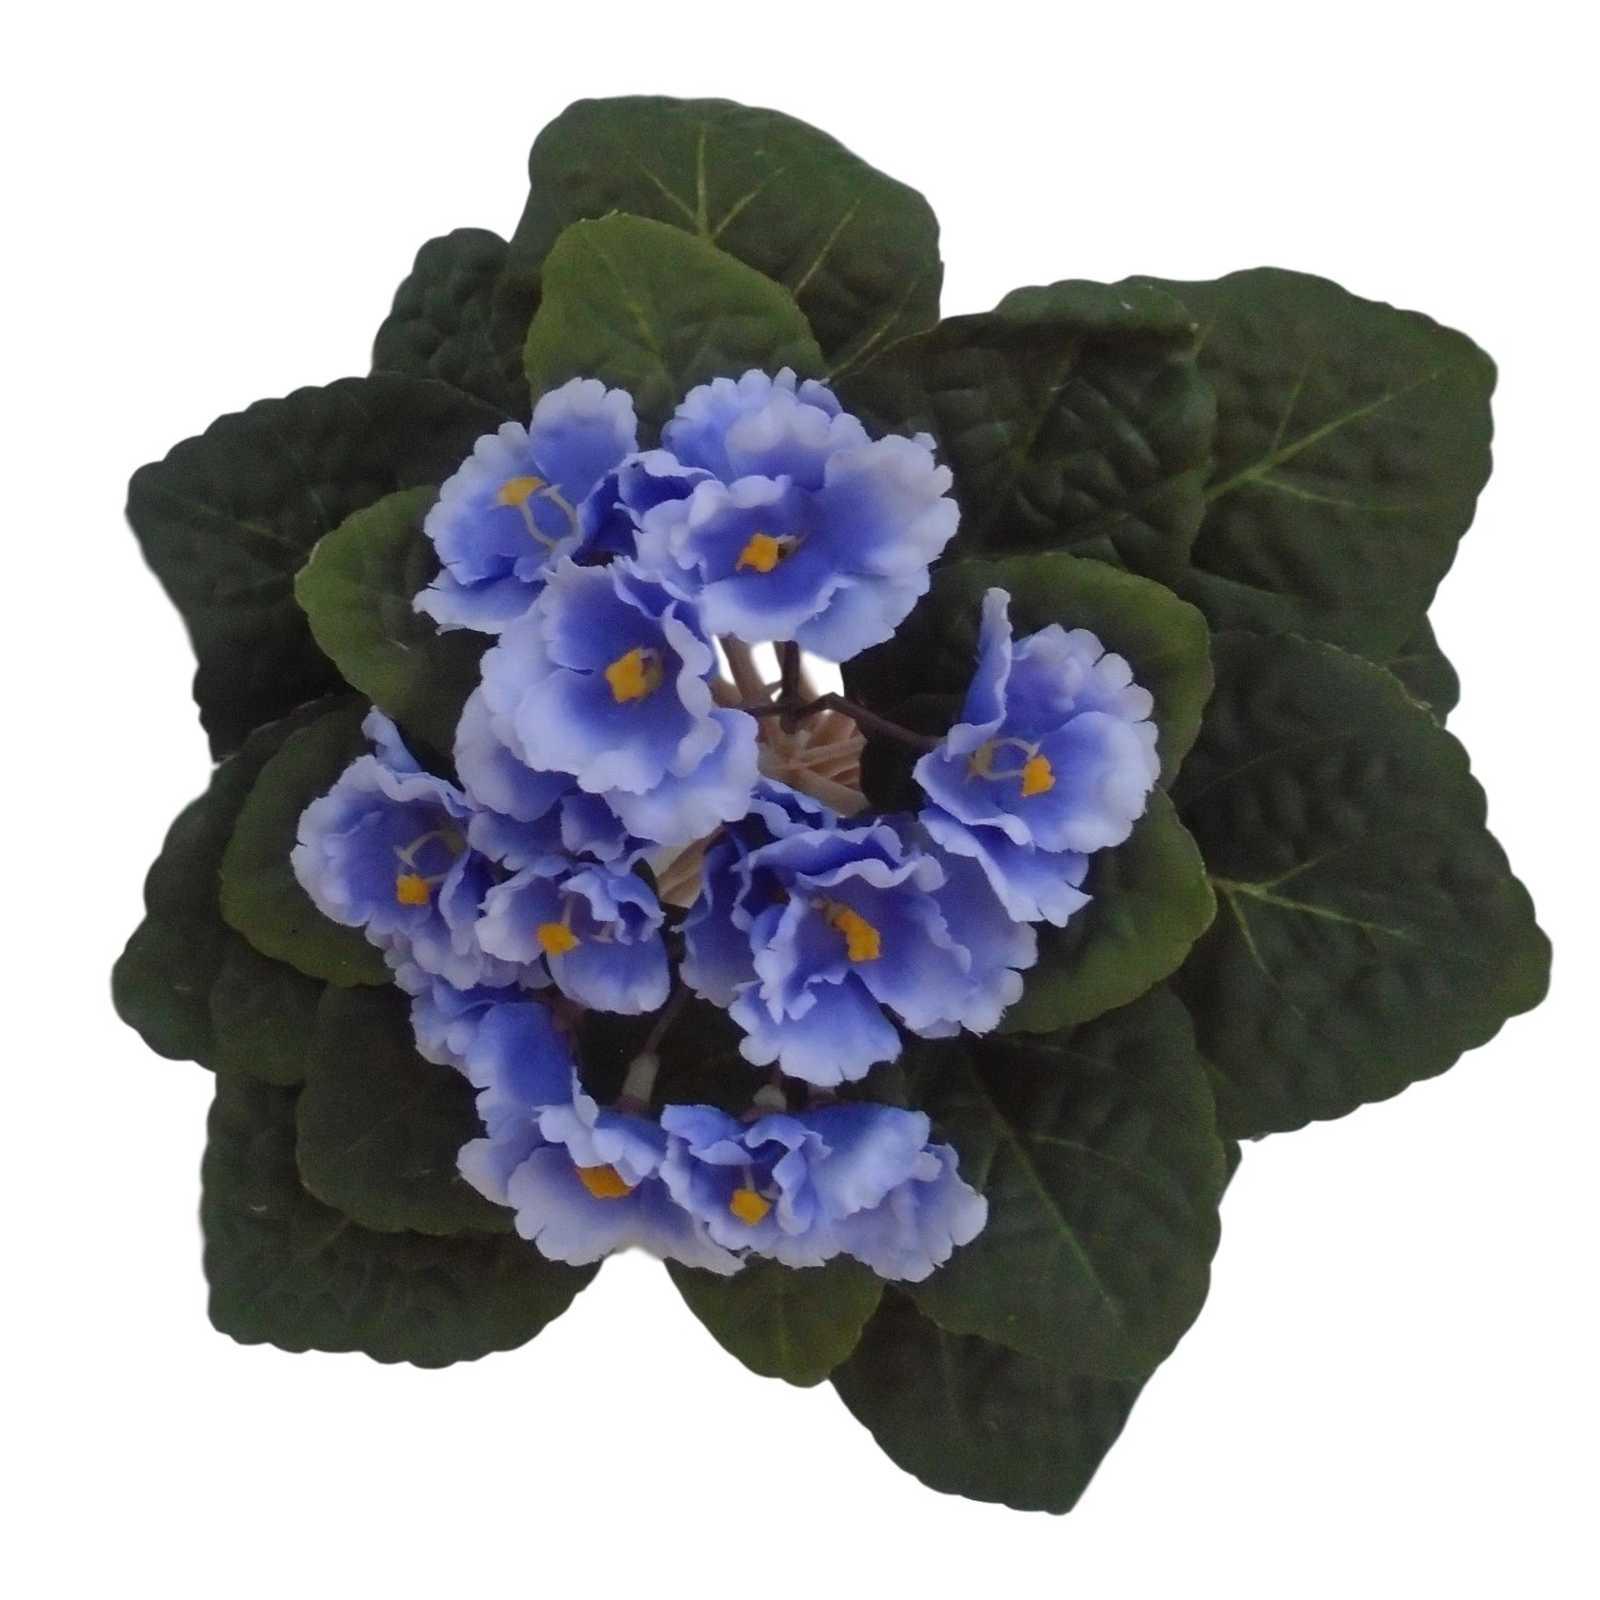 Flor artificiail violeta cor lilás aparencia realista